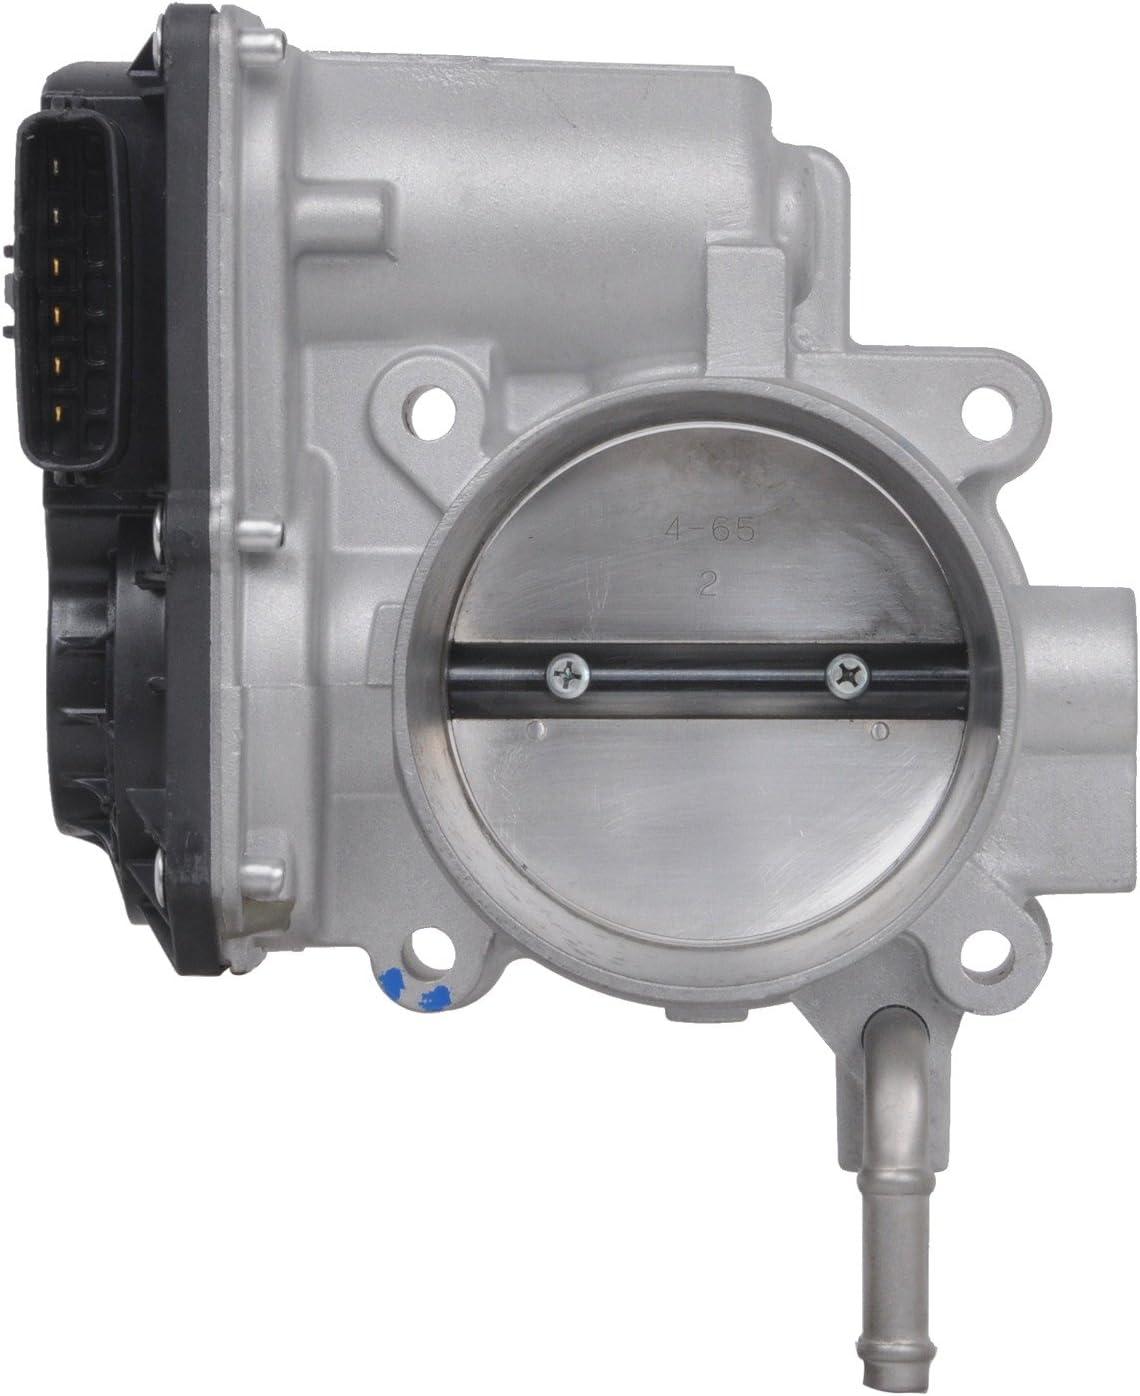 Fuel Injection Throttle Body Cardone 67-8015 Reman